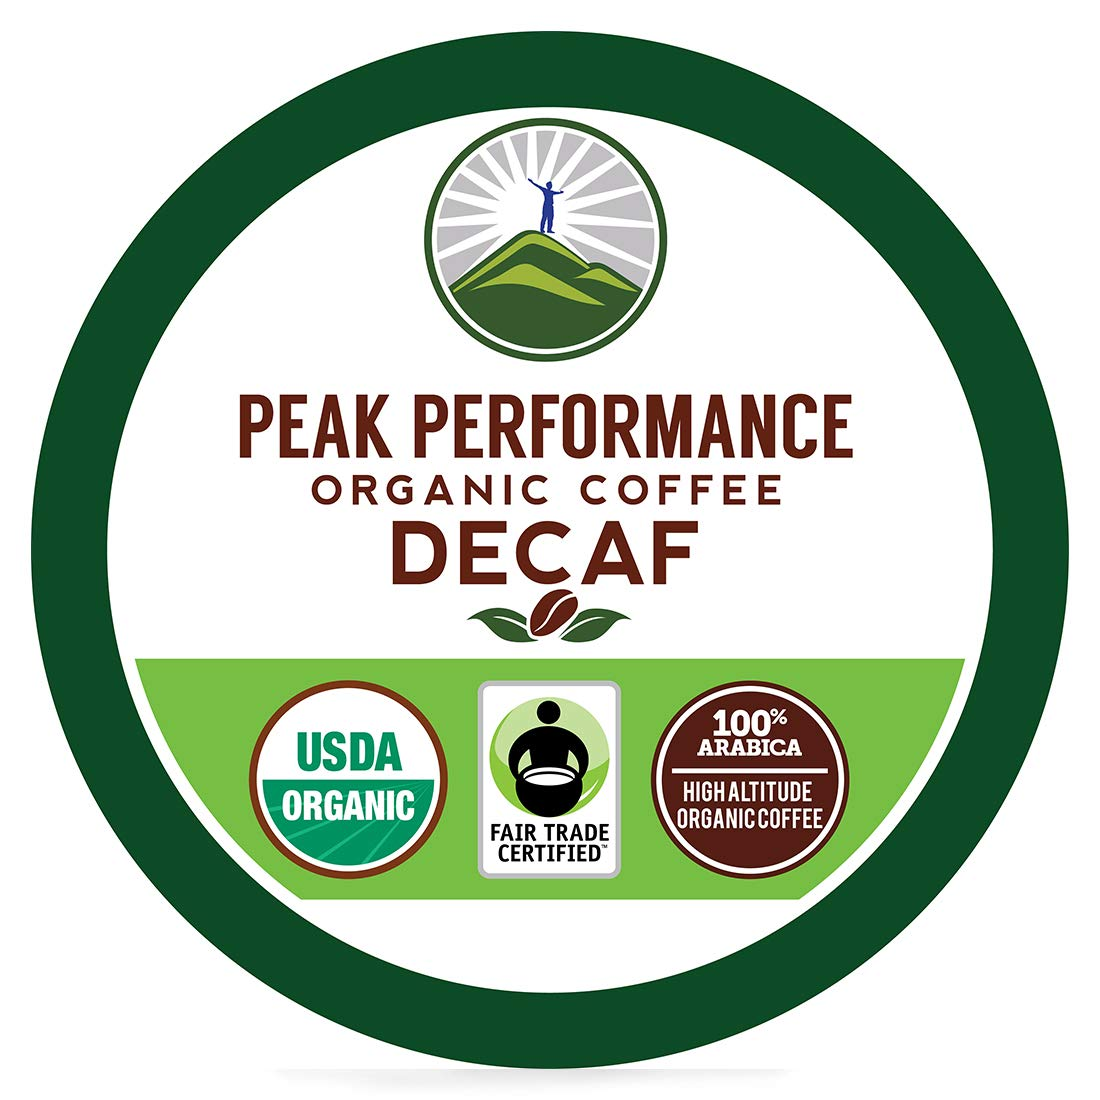 Organic DECAF K Cups - Peak Performance High Altitude Organic DECAF Coffee Pods For High Performance Individuals. Fair Trade Beans Organic Medium Roast K Cup Single Serve Keurig Decaffeinated KCups